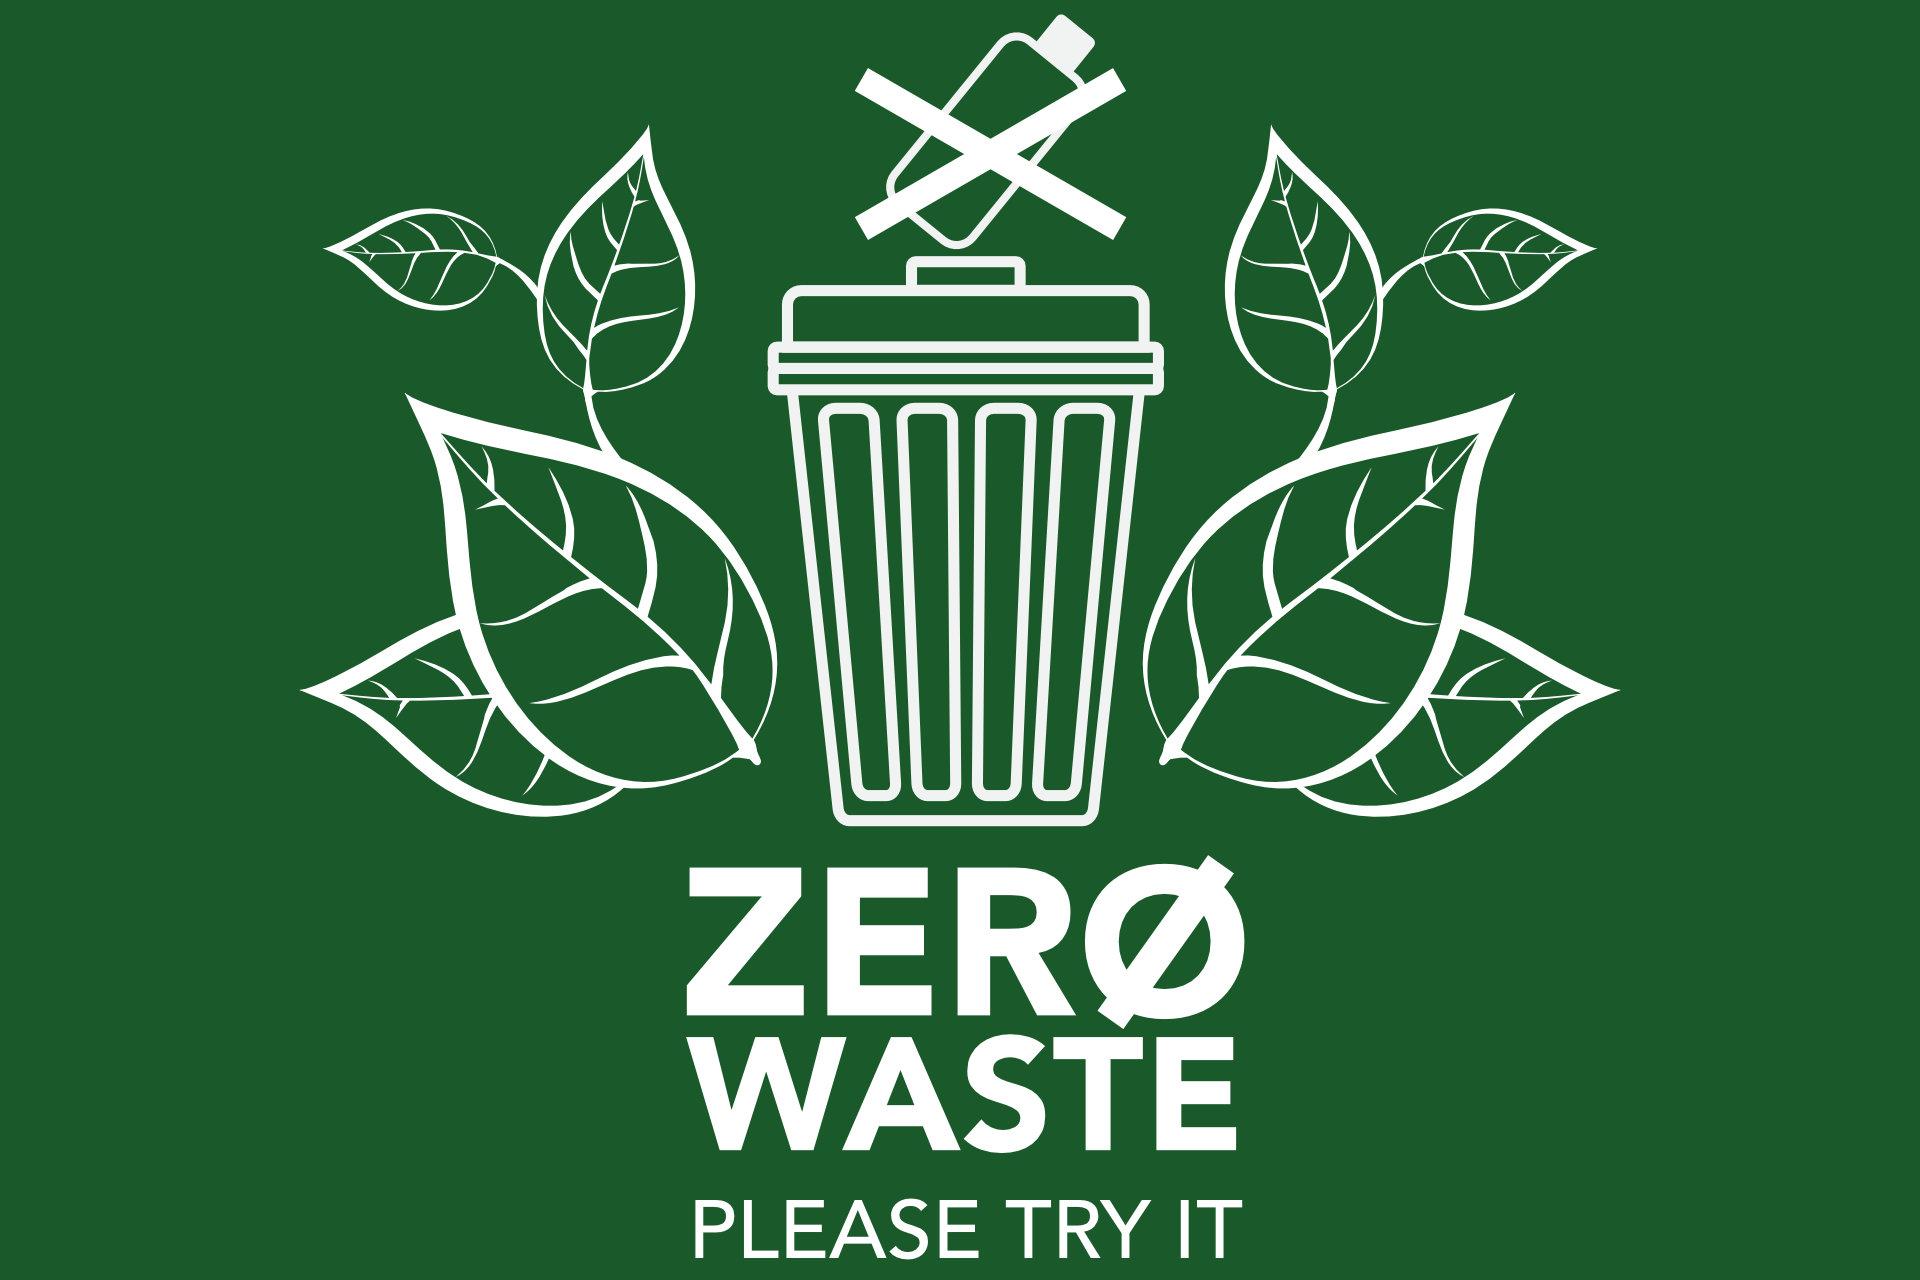 Zero Waste Bin